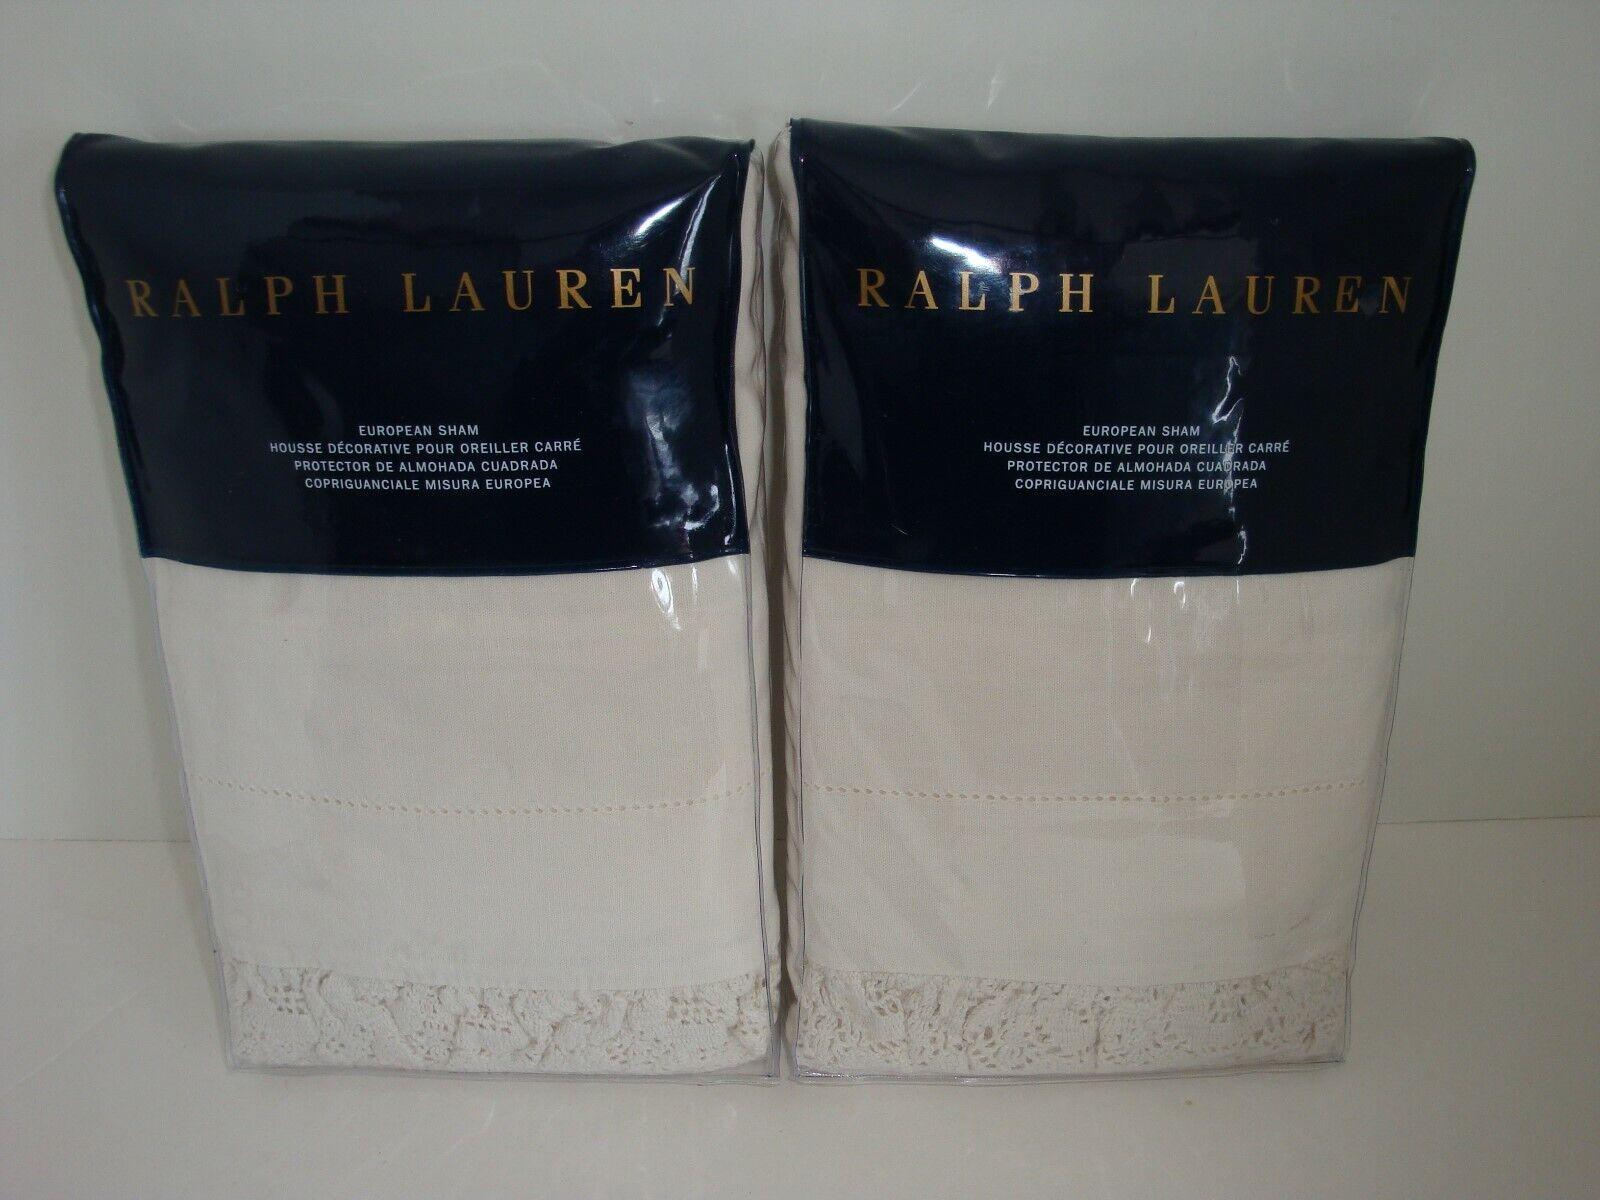 Ralph Lauren Hoxton Margaret S 2 Euro Shams NIP Cream Linen Cotton Crochet Edge